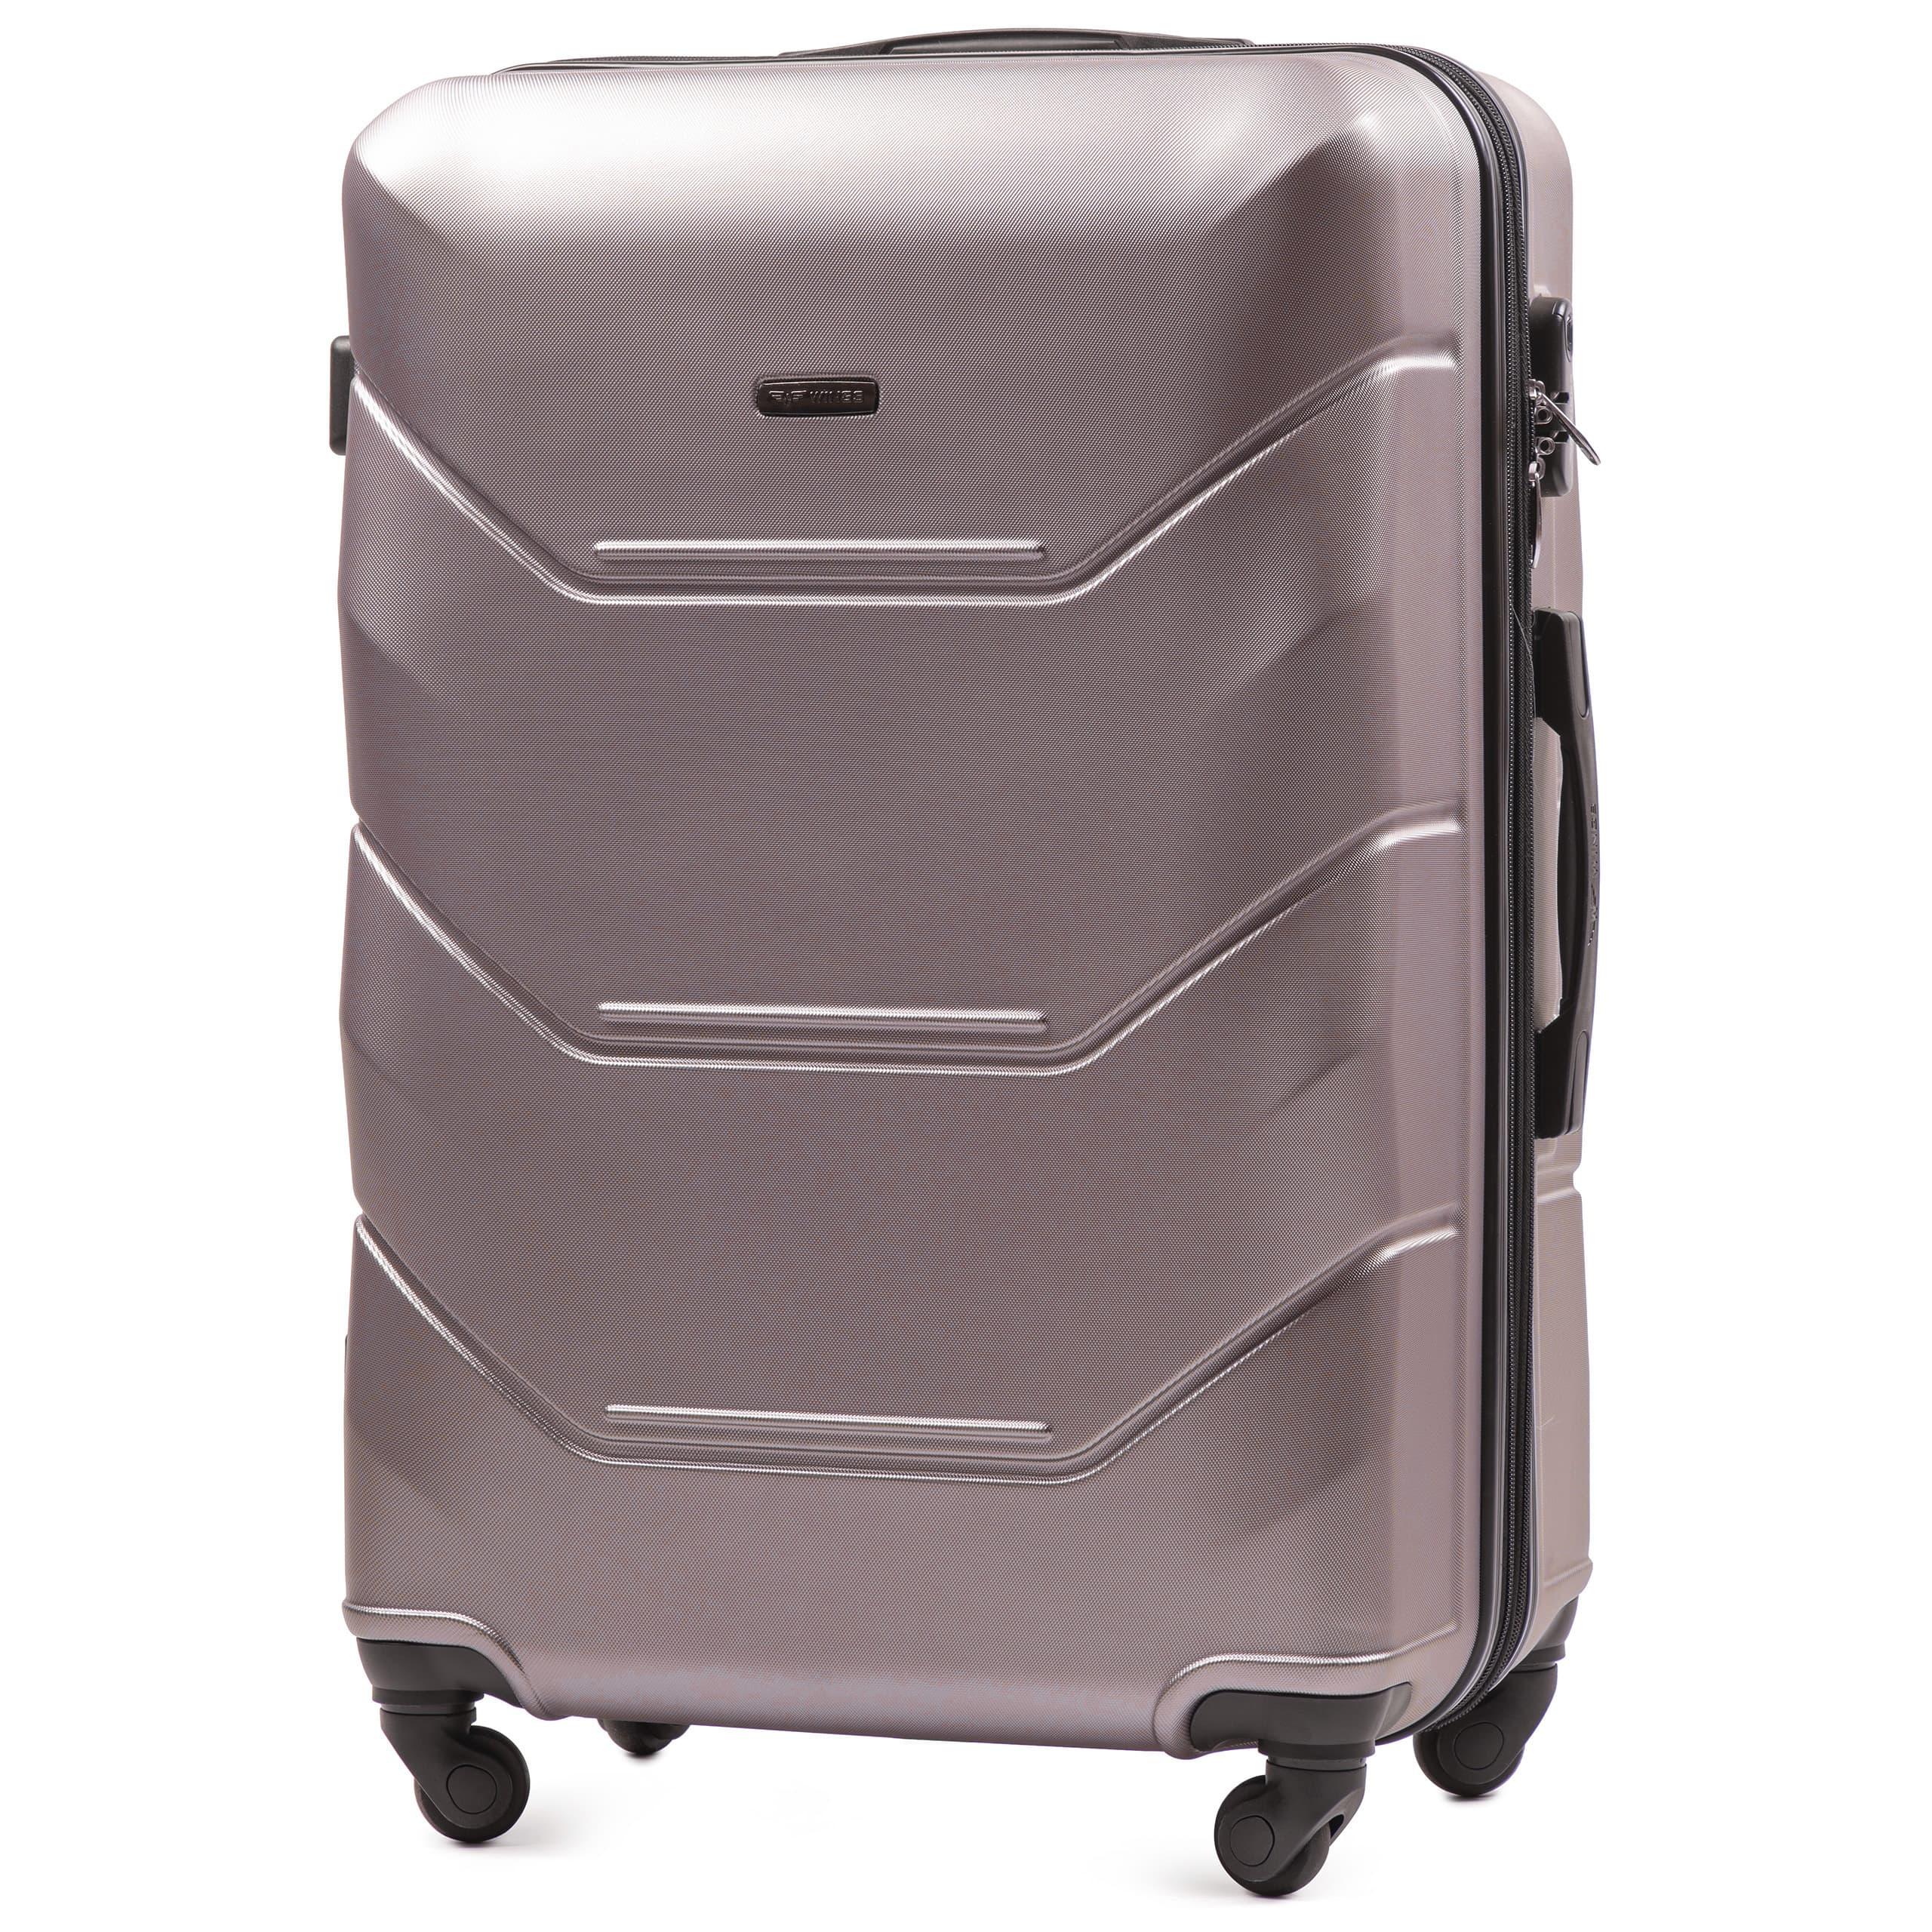 БОЛЬШОЙ ЧЕМОДАН WINGS 147 L ROSE-GOLD  PREMIUM НА 4-Х КАУЧУКОВЫХ КОЛЕСАХ! Для багажа ,до 23 кг!